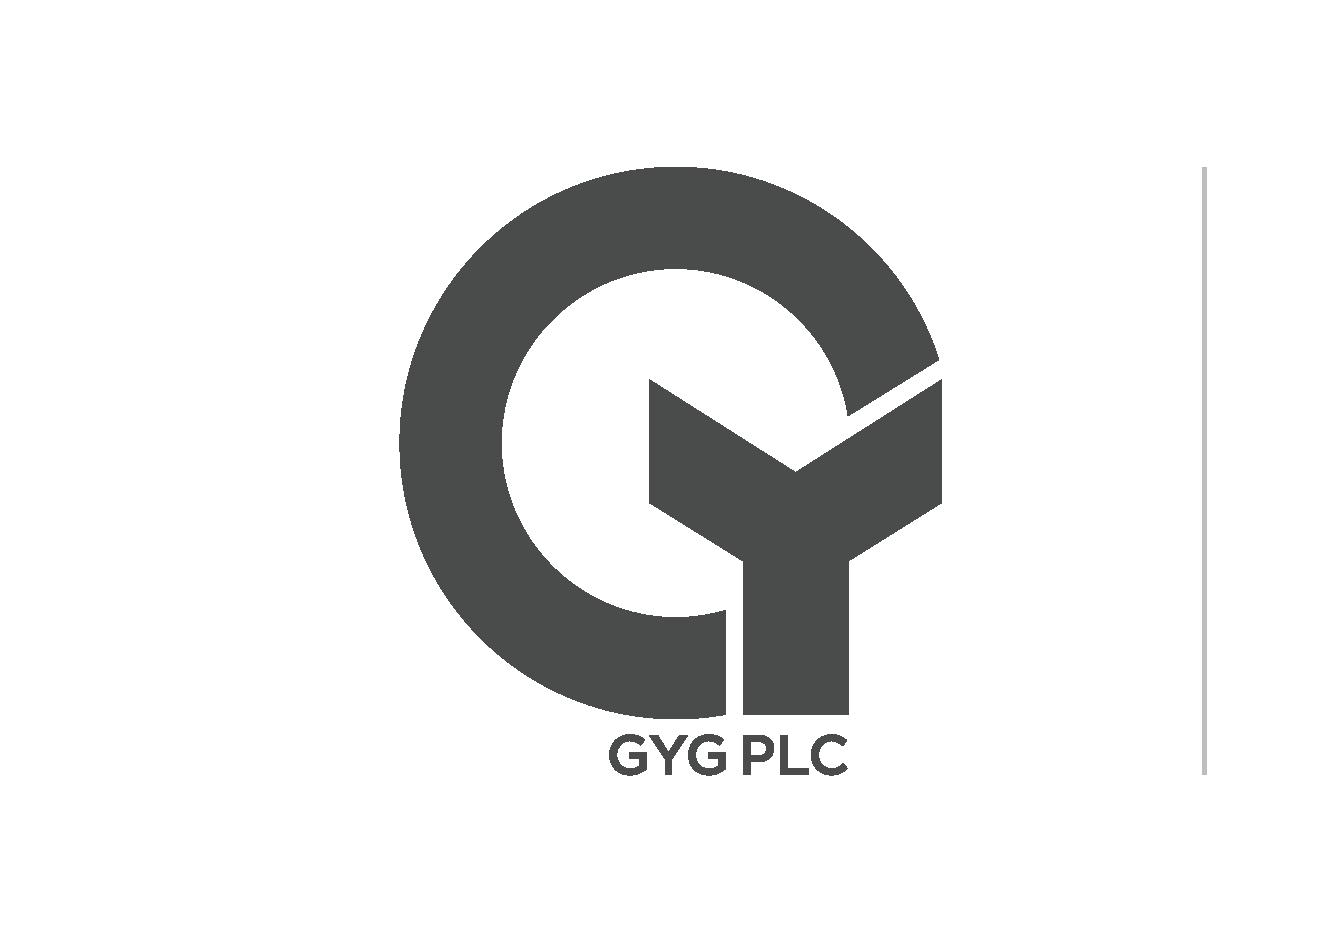 A member of GYG plc